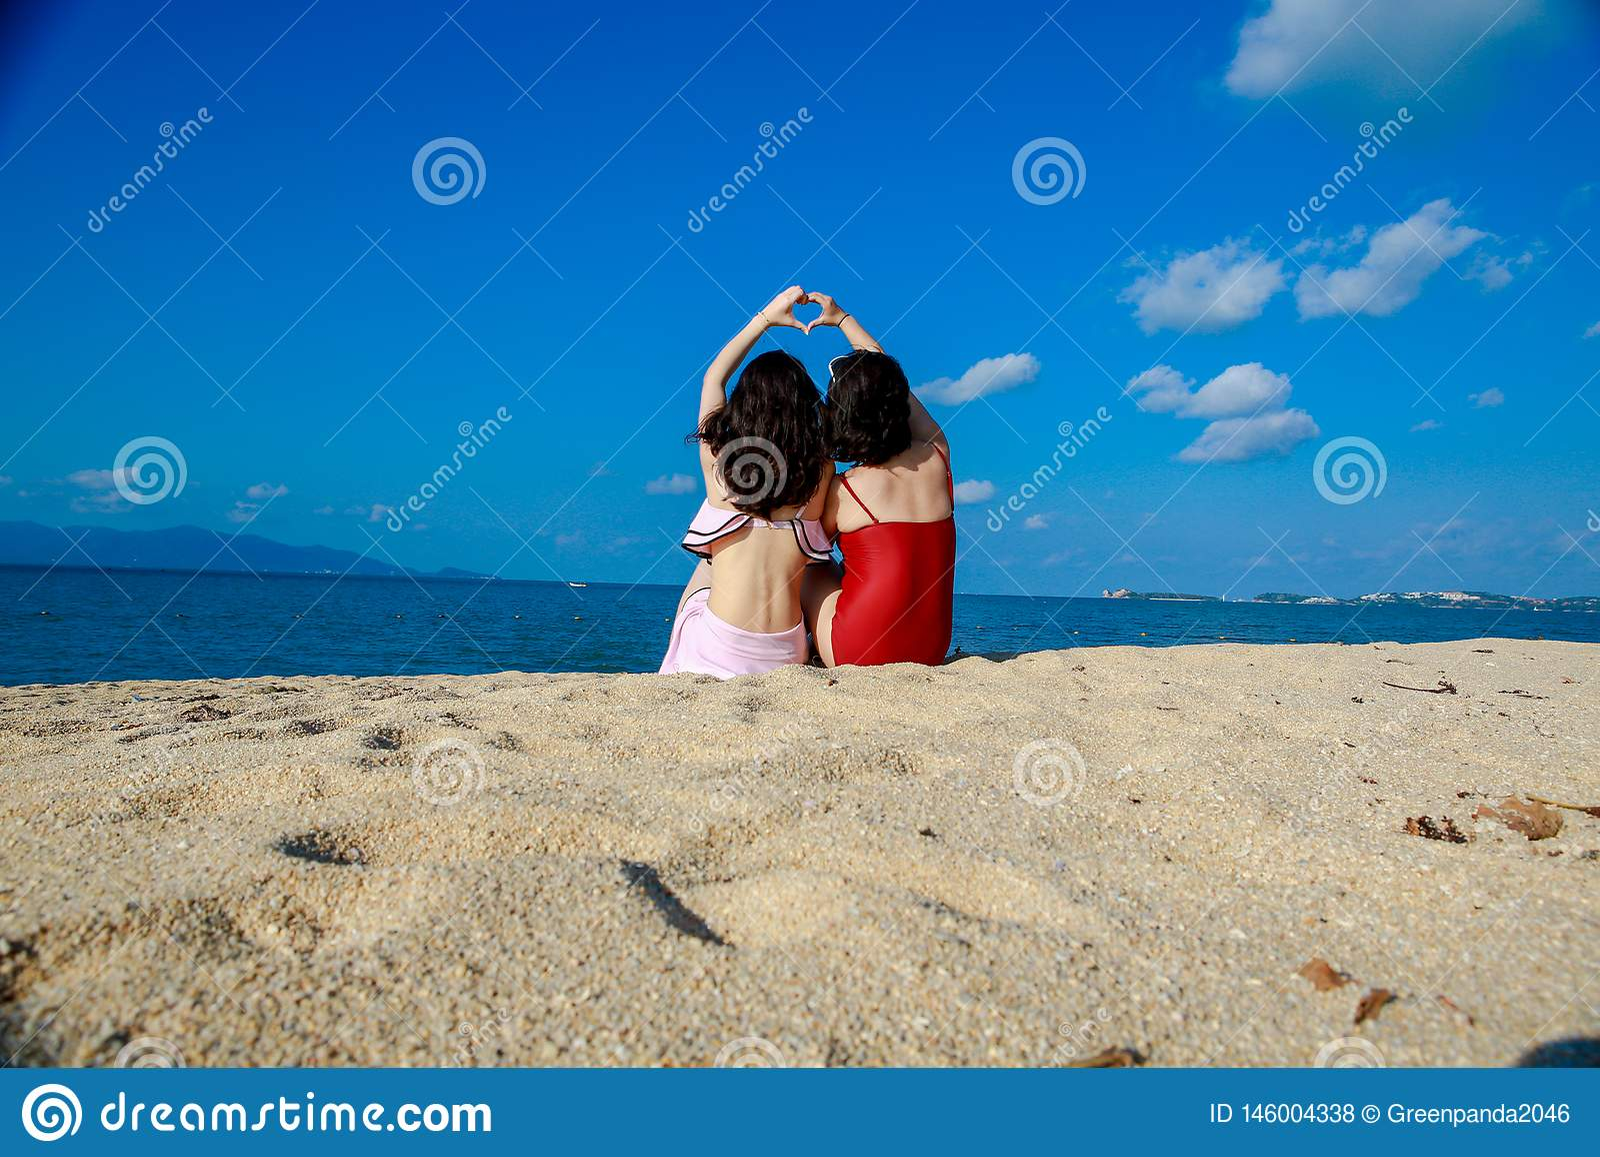 Happy girls on the beach-good friend